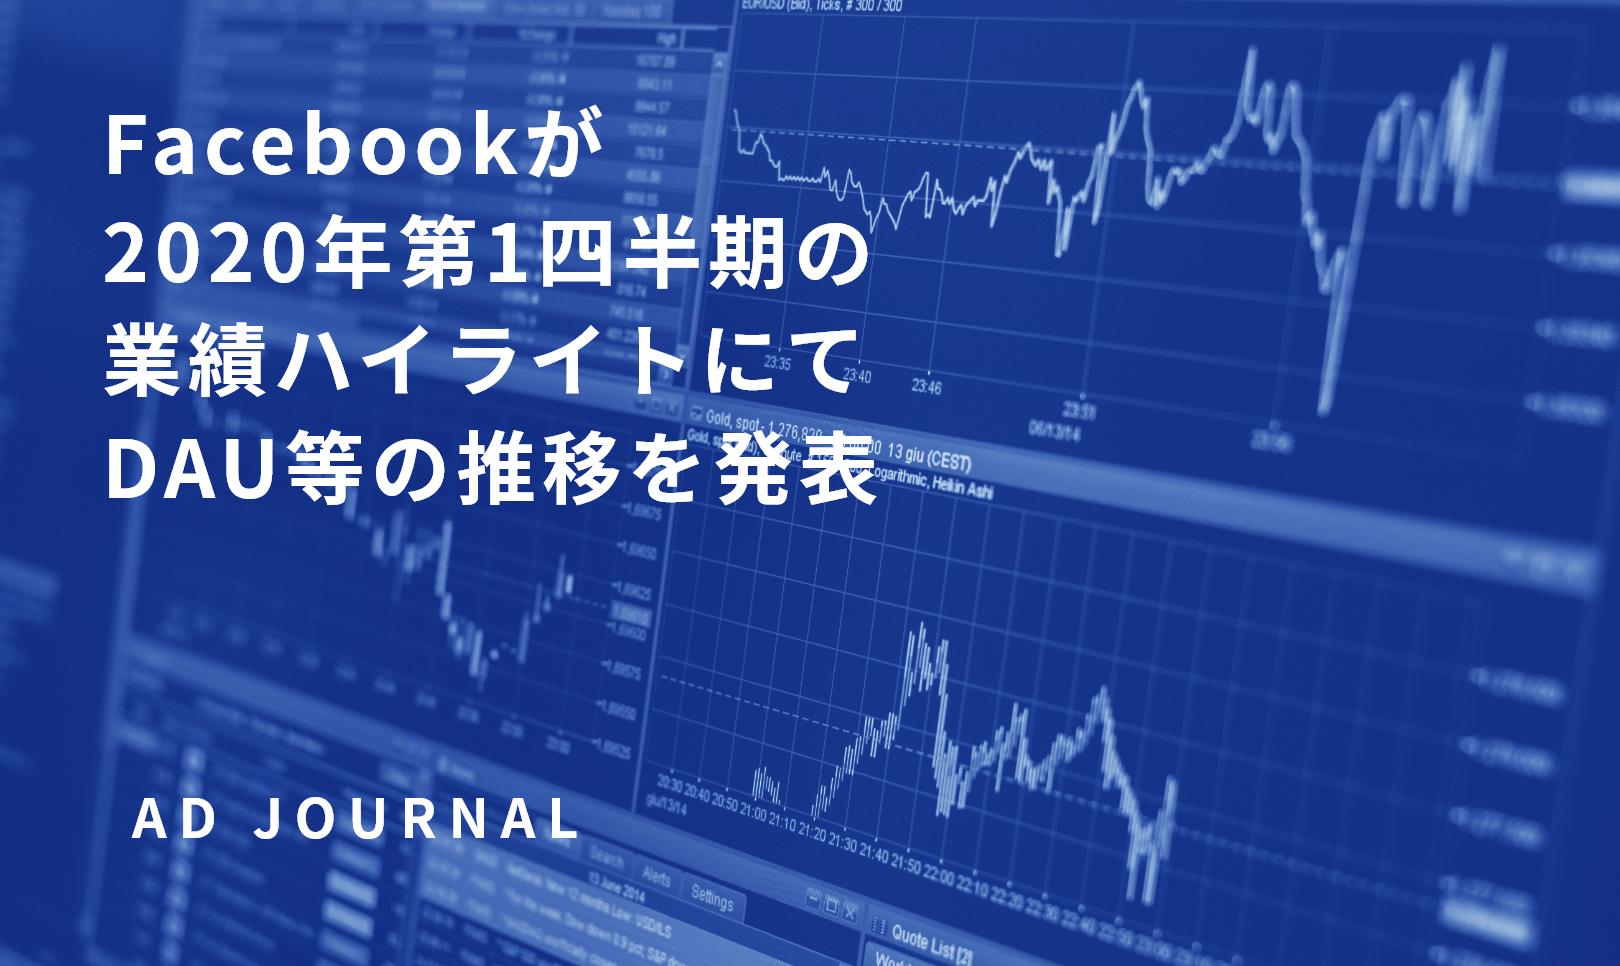 Facebookが2020年第1四半期の業績ハイライトにてDAU等の推移を発表